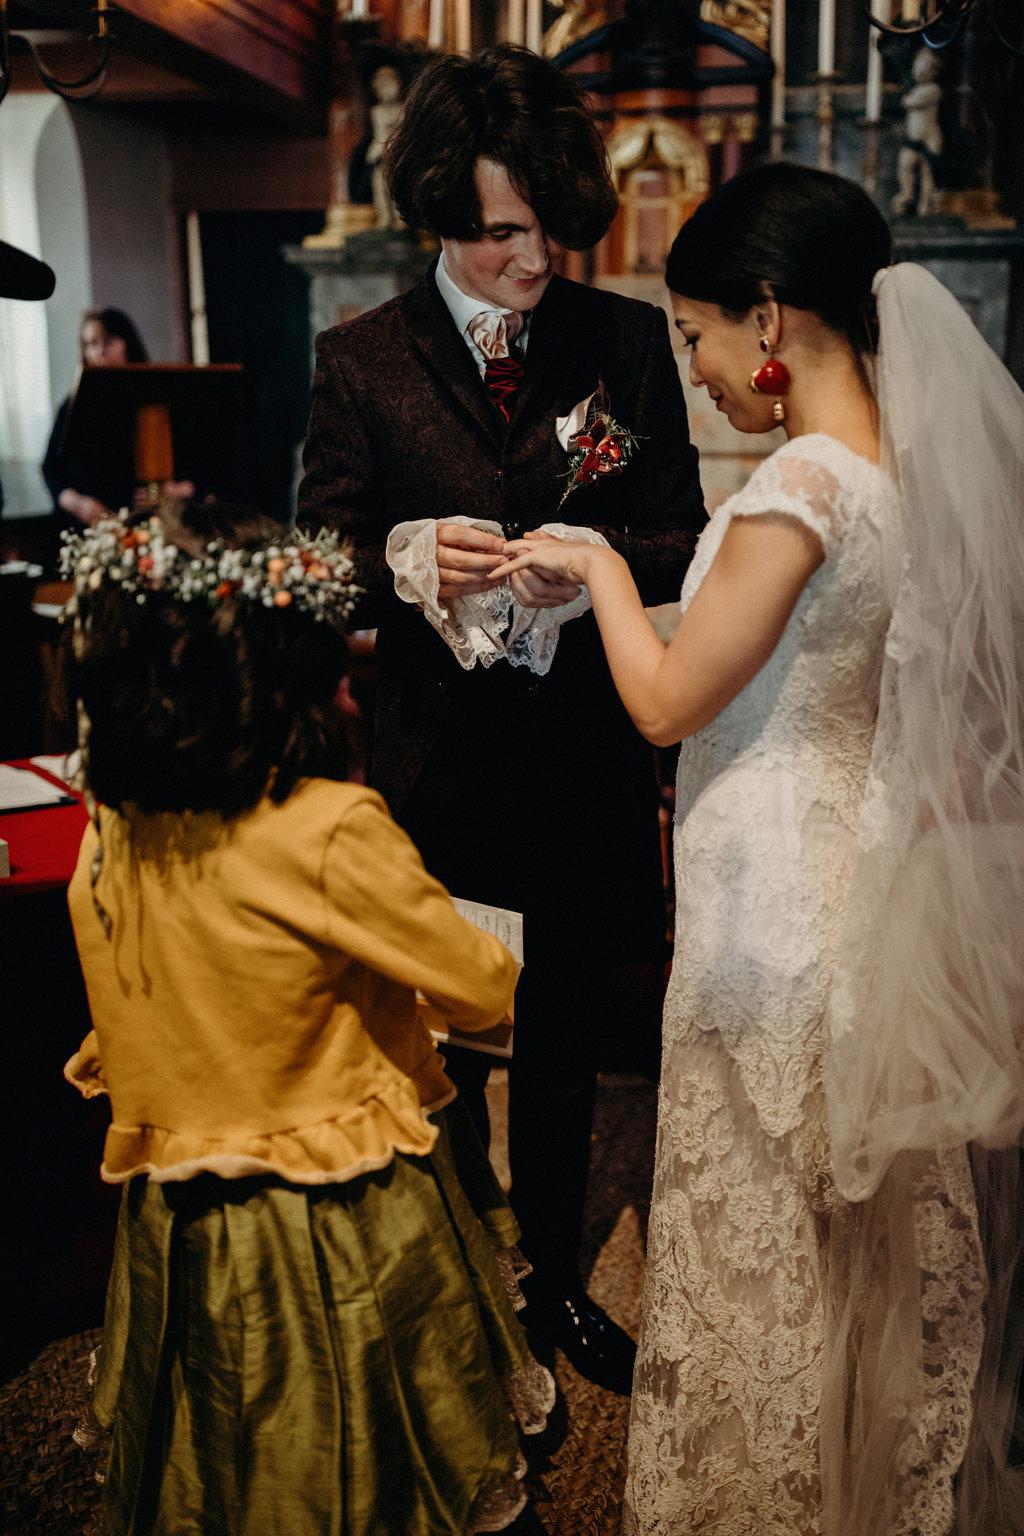 195-sjoerdbooijphotography-wedding-coen-janaina.jpg